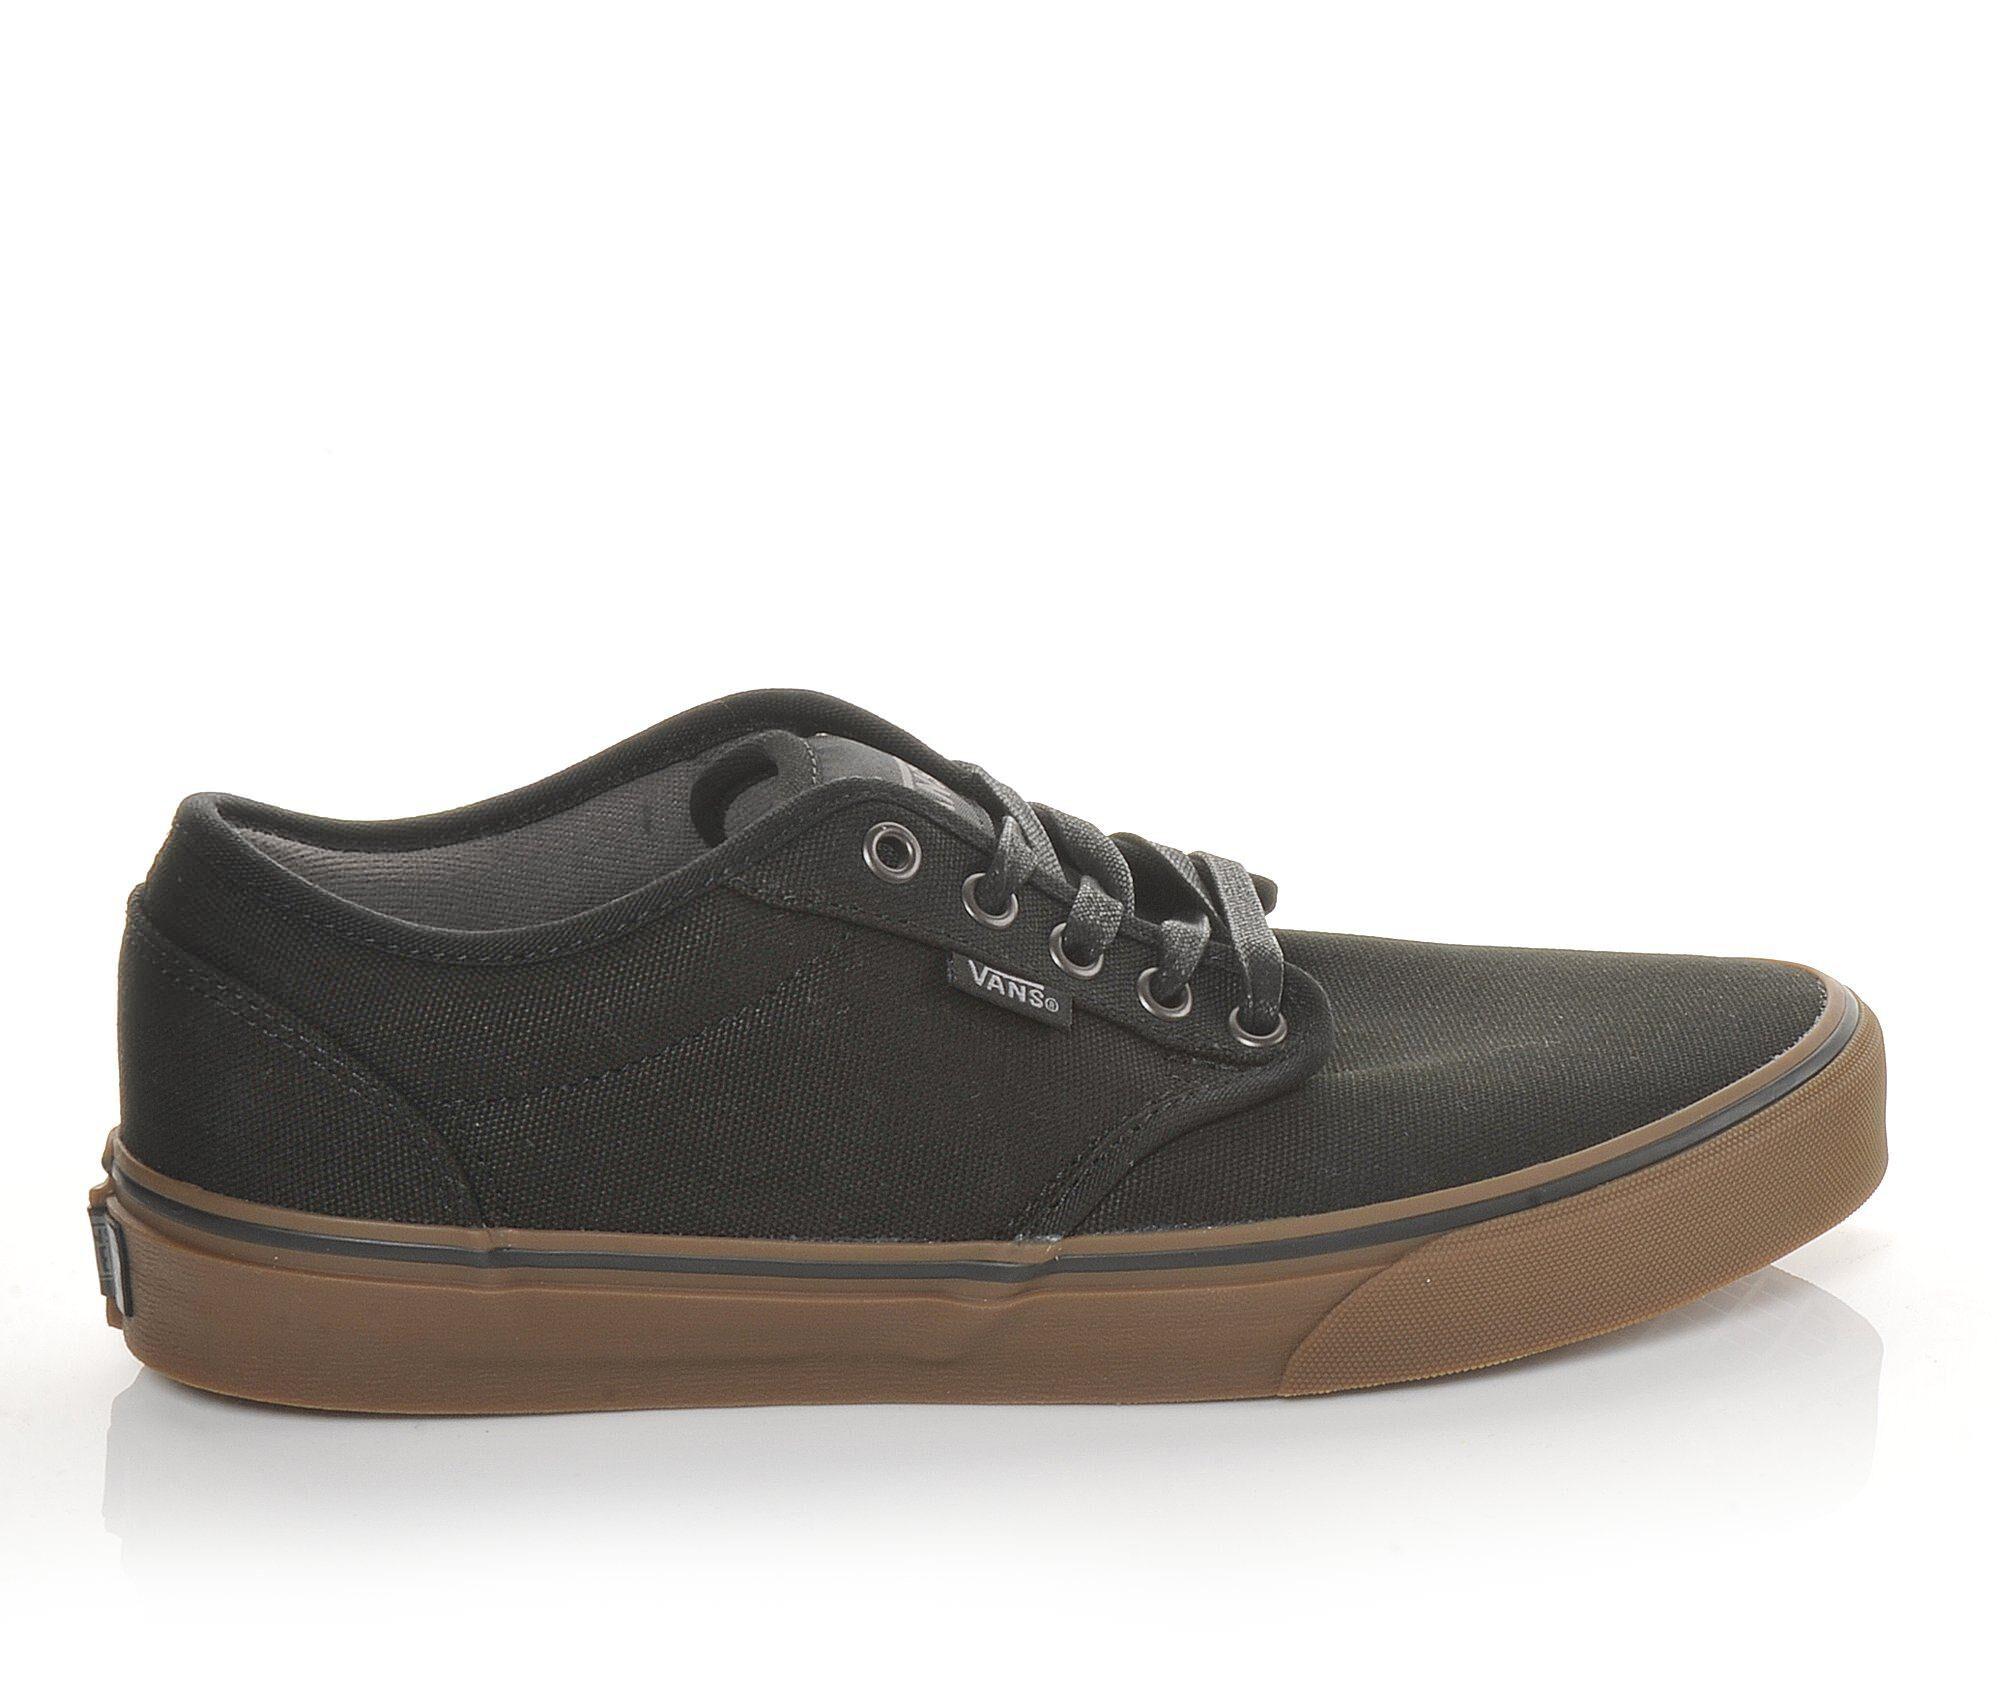 Vans Atwood Skate Shoes | Shoe Carnival